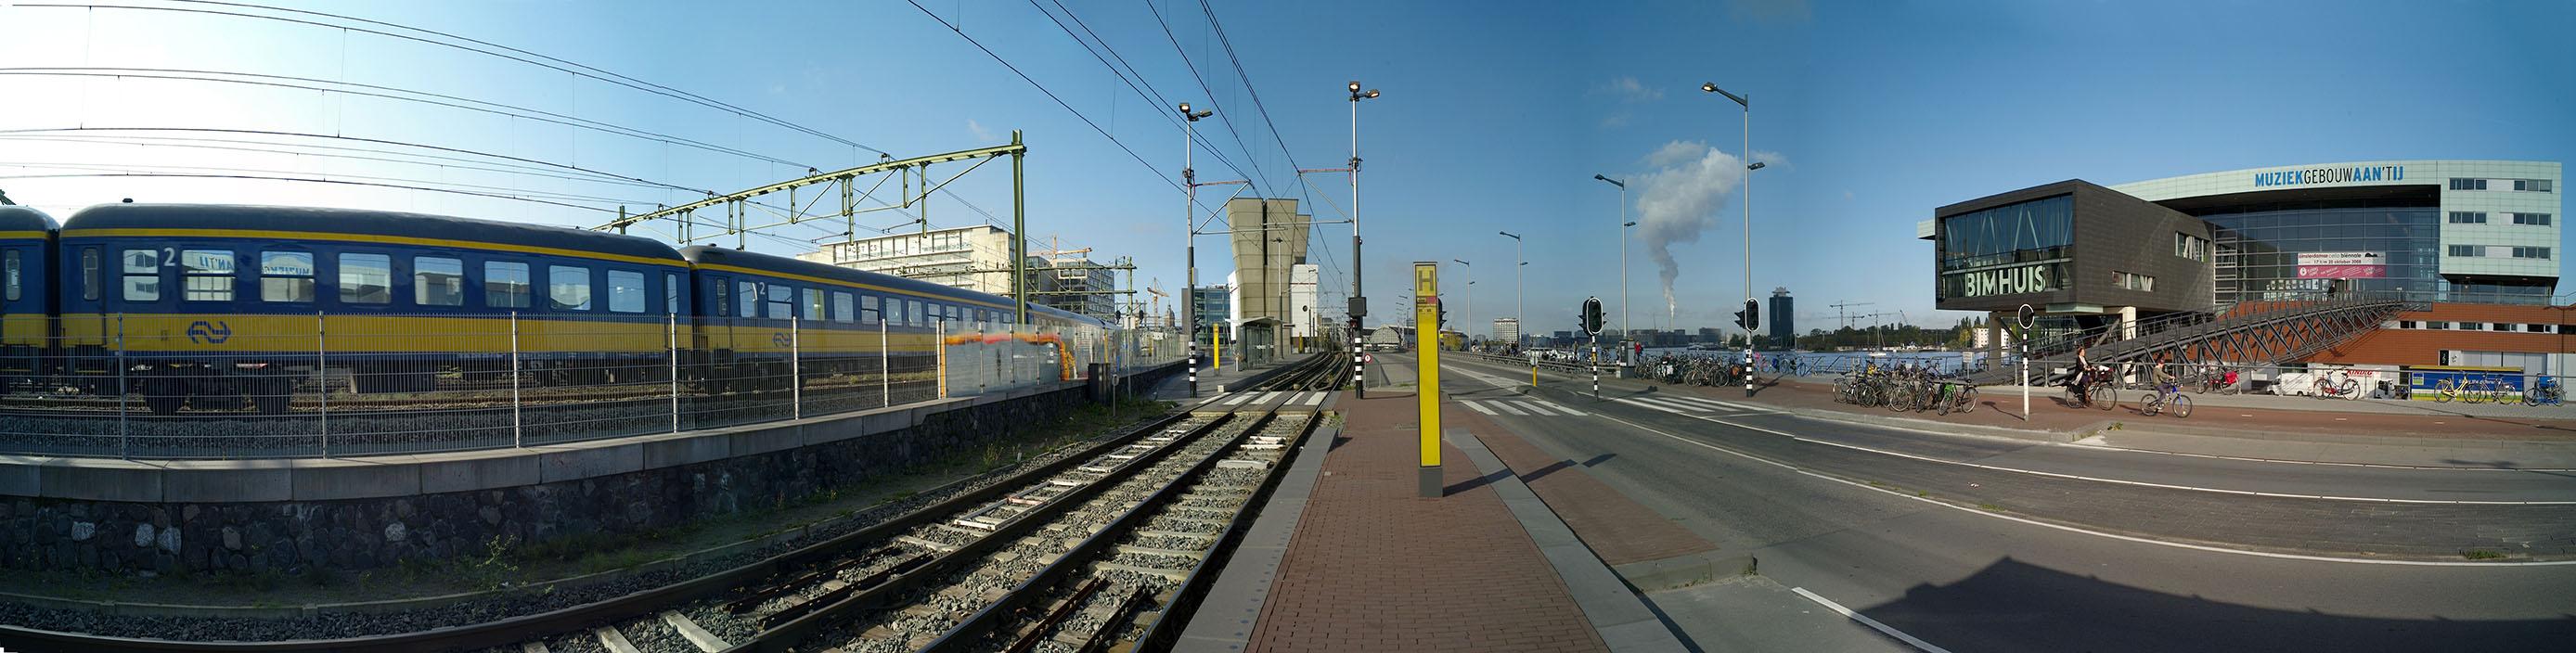 011_Netherlands_-_North_Holland_-_Amsterdam.jpg